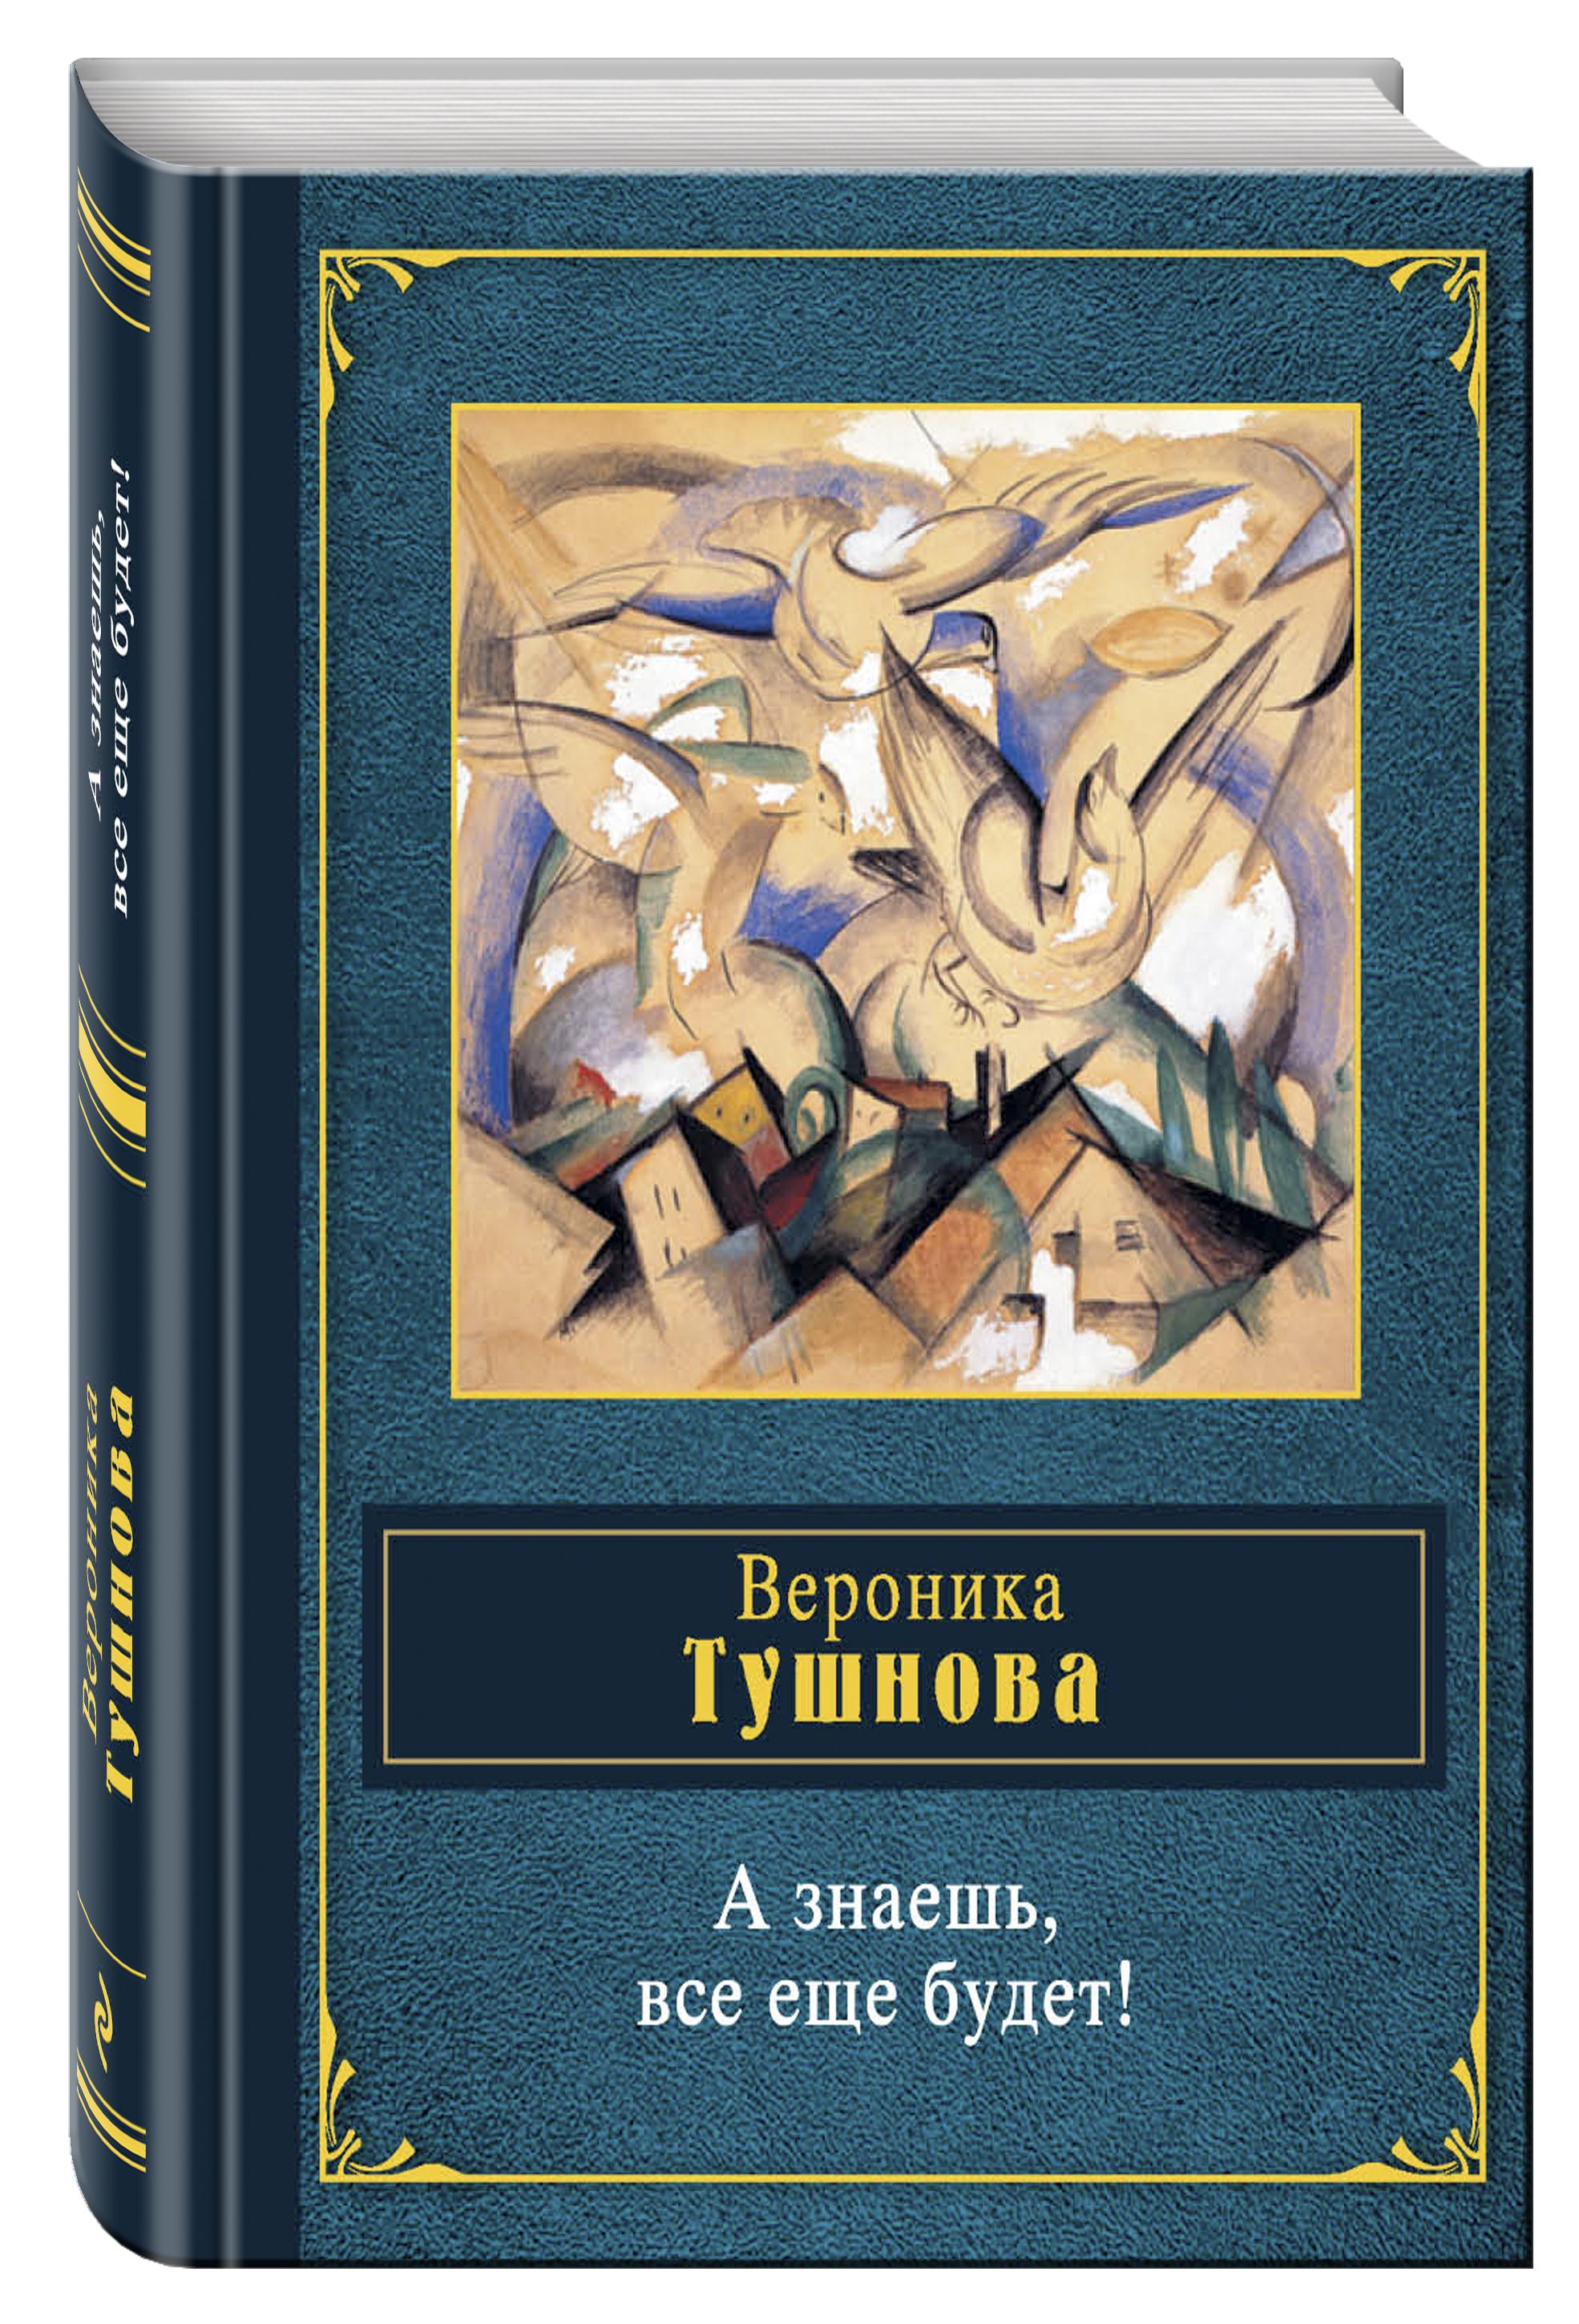 Тушнова В.М. А знаешь, все еще будет! ISBN: 978-5-699-61100-3 тушнова в лирика